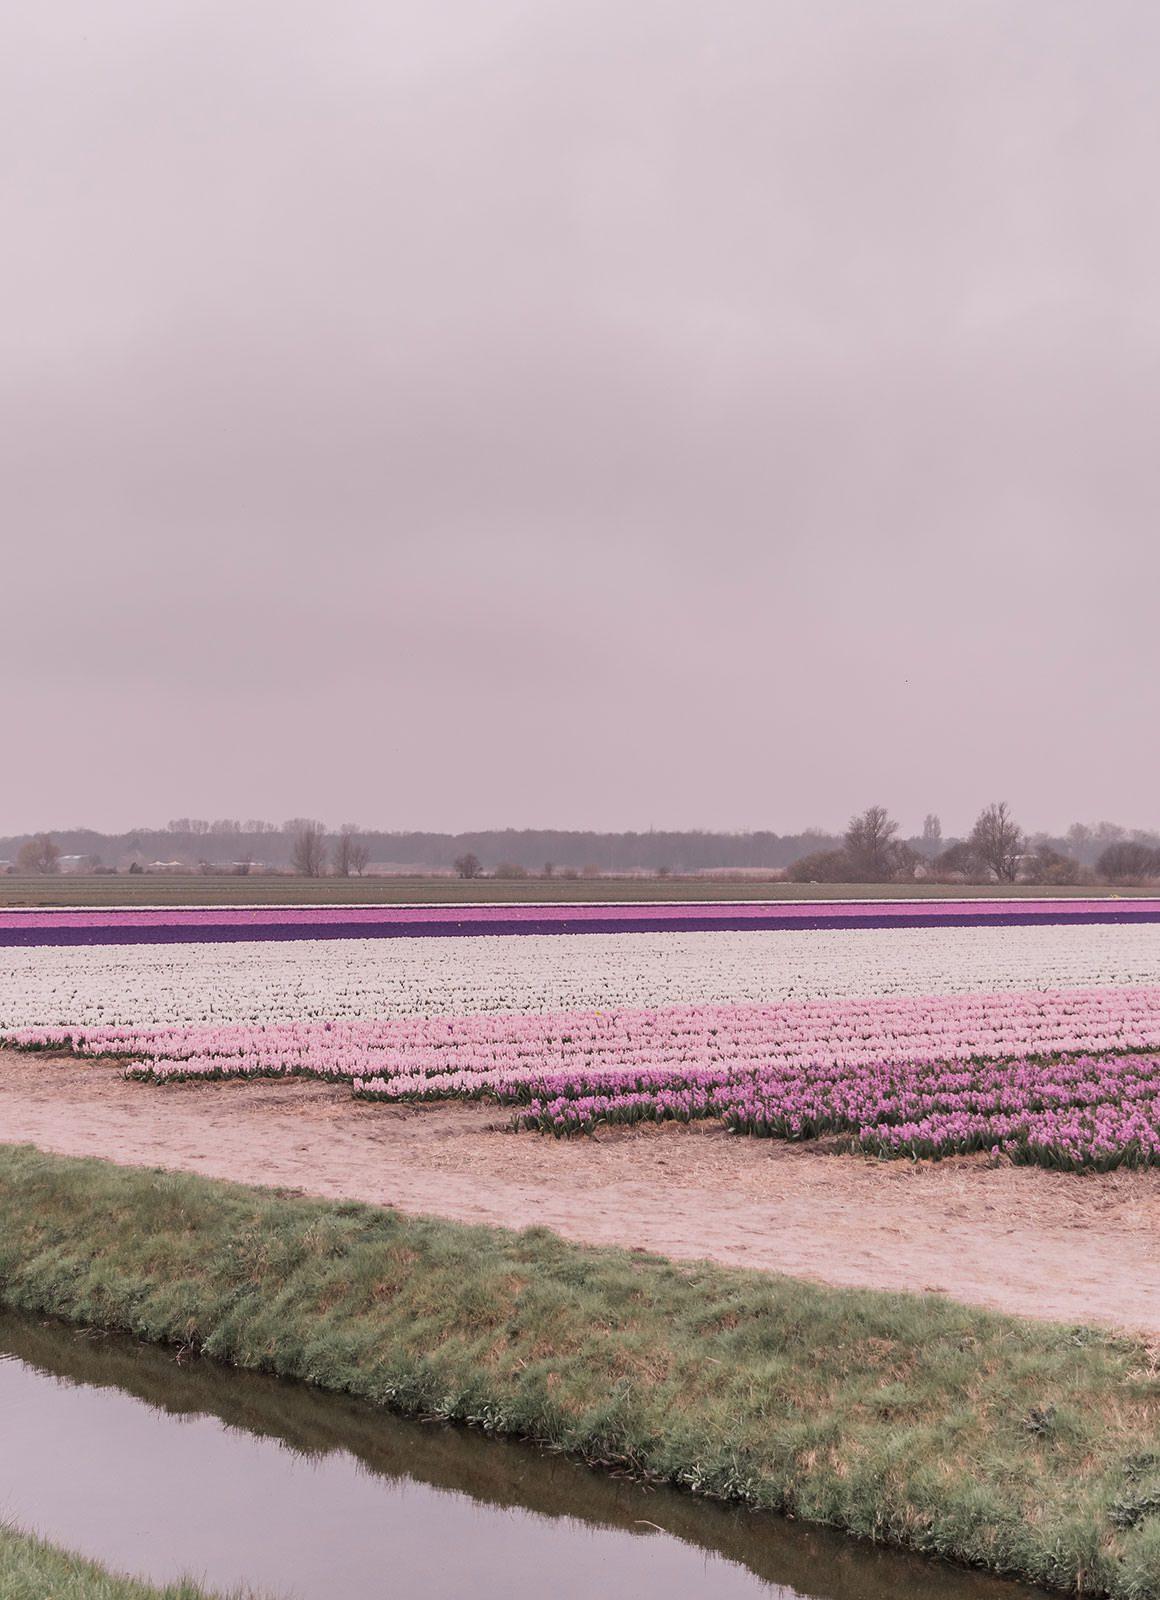 Weekend in the Netherlands - Lisse, Keukenhof